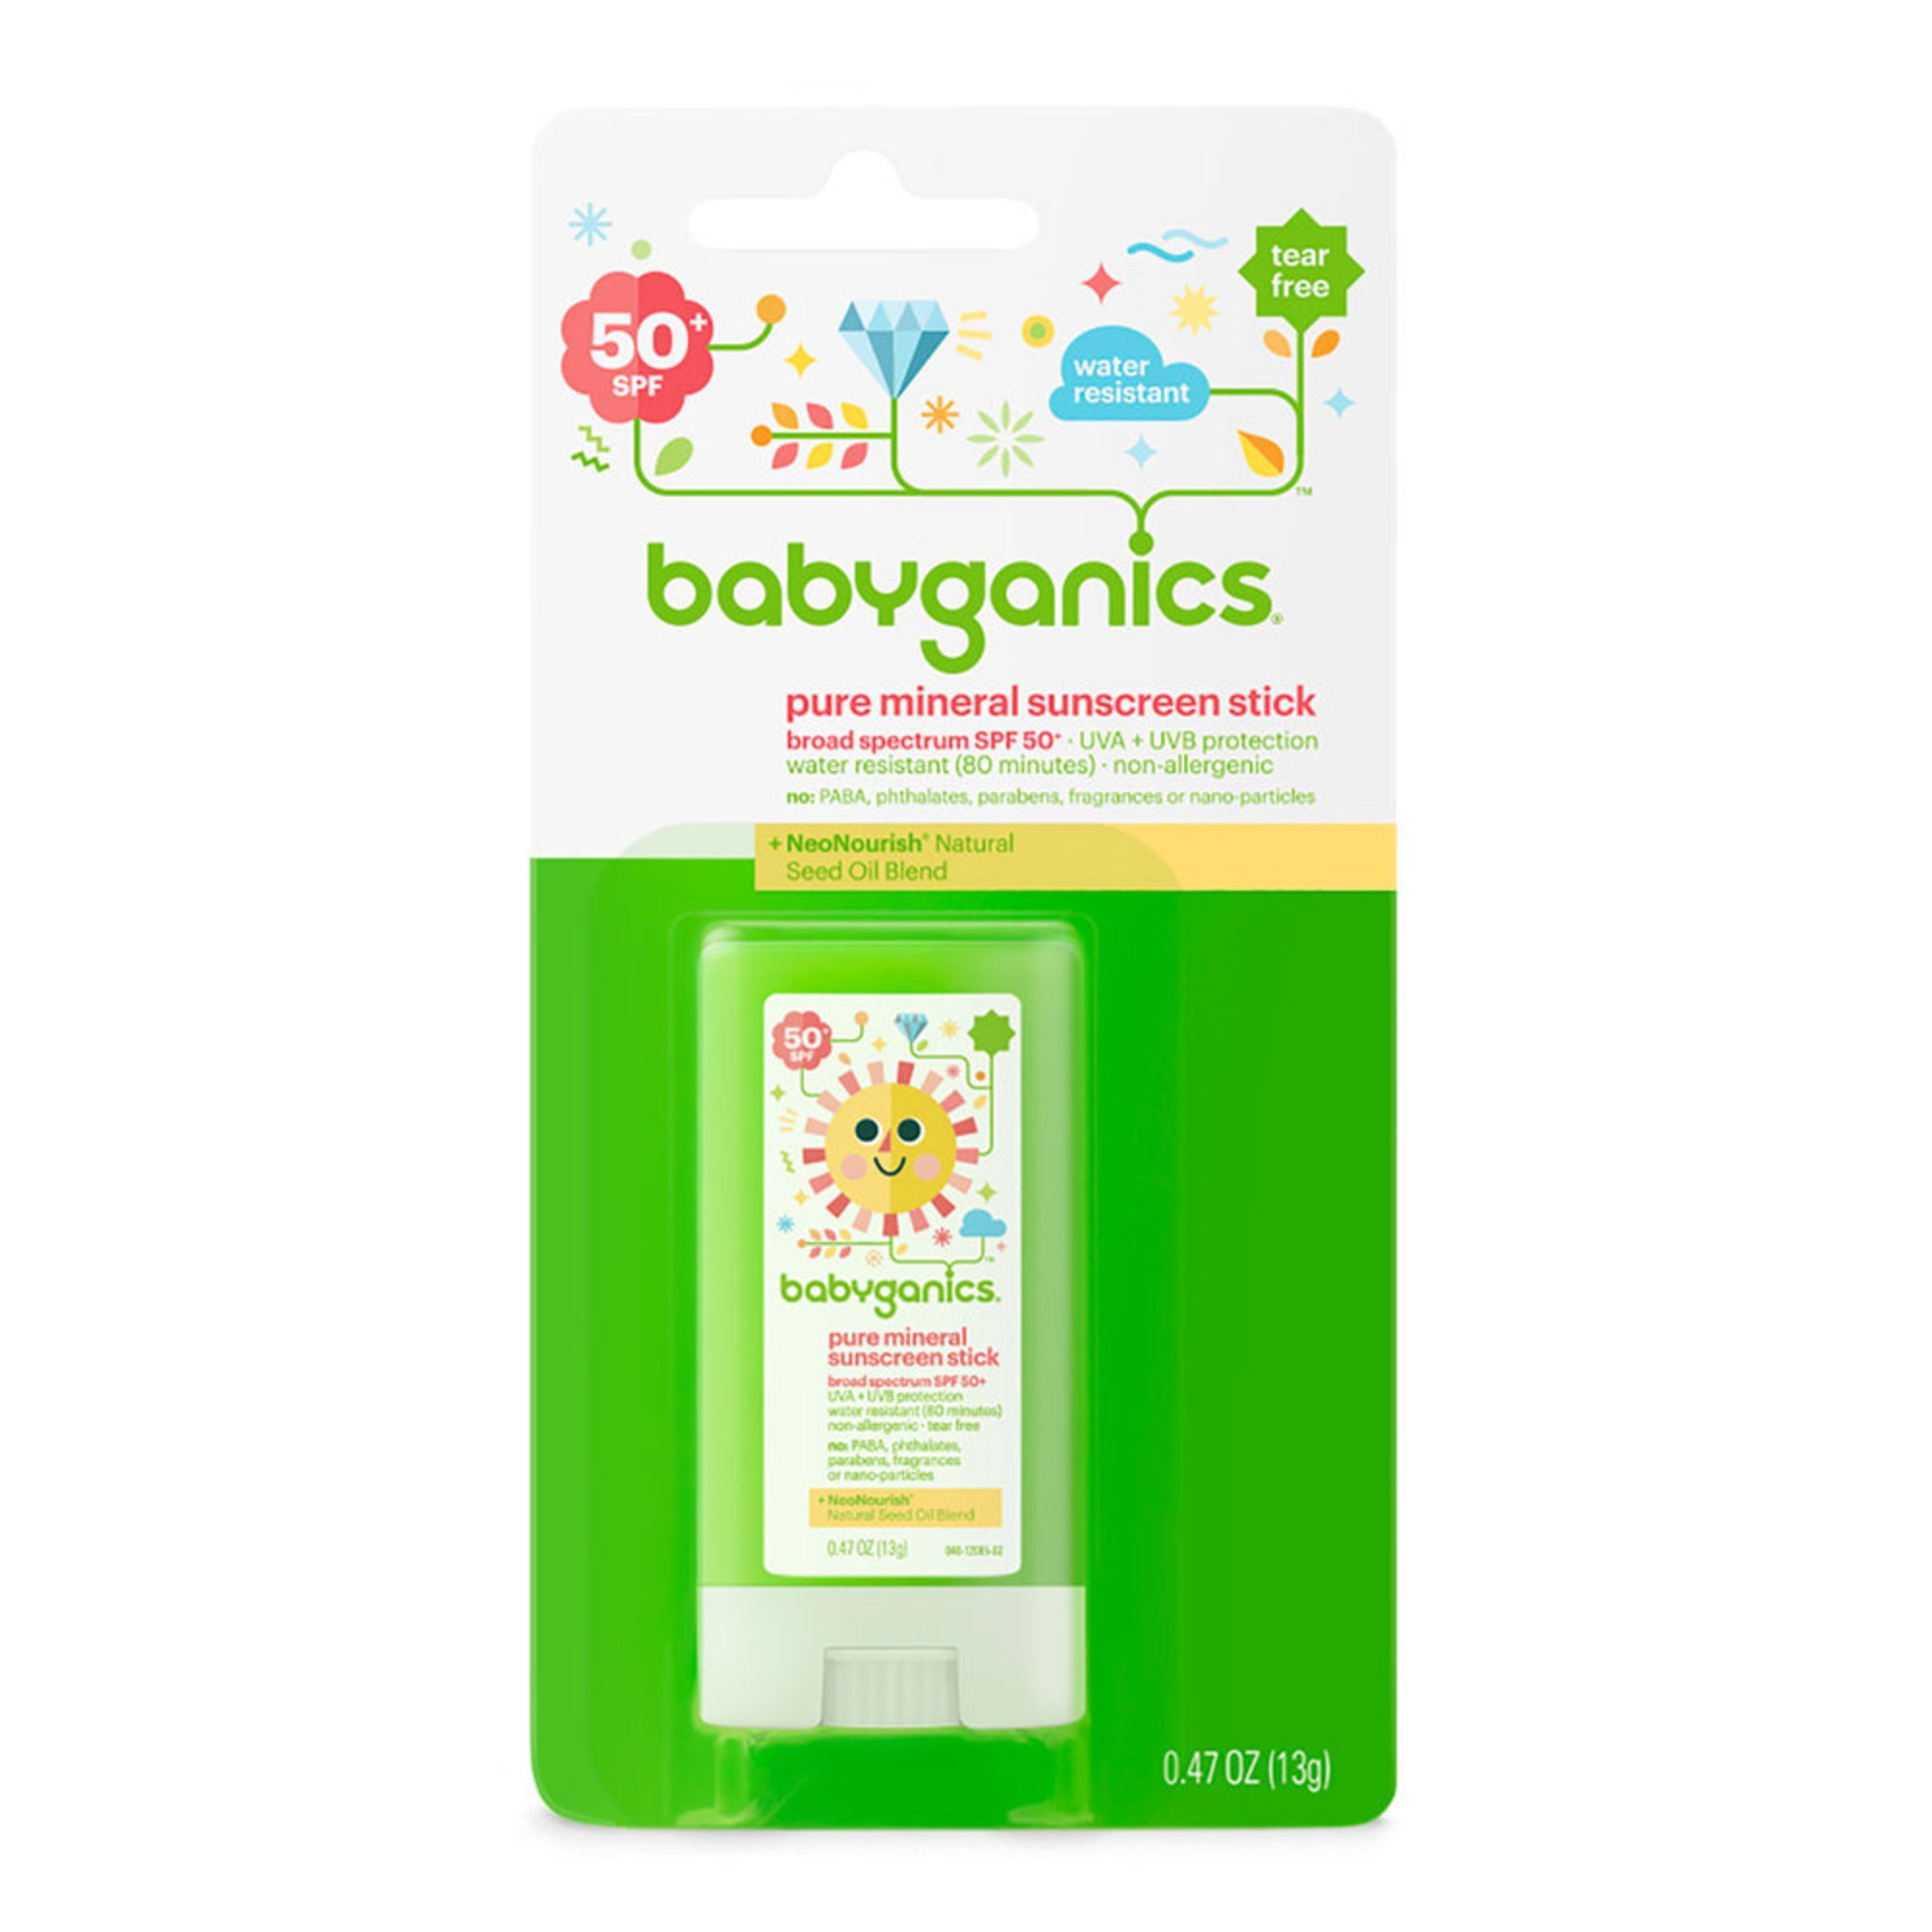 Babyganics Pure Mineral Sunscreen Stick 50 Spf Sunscreen